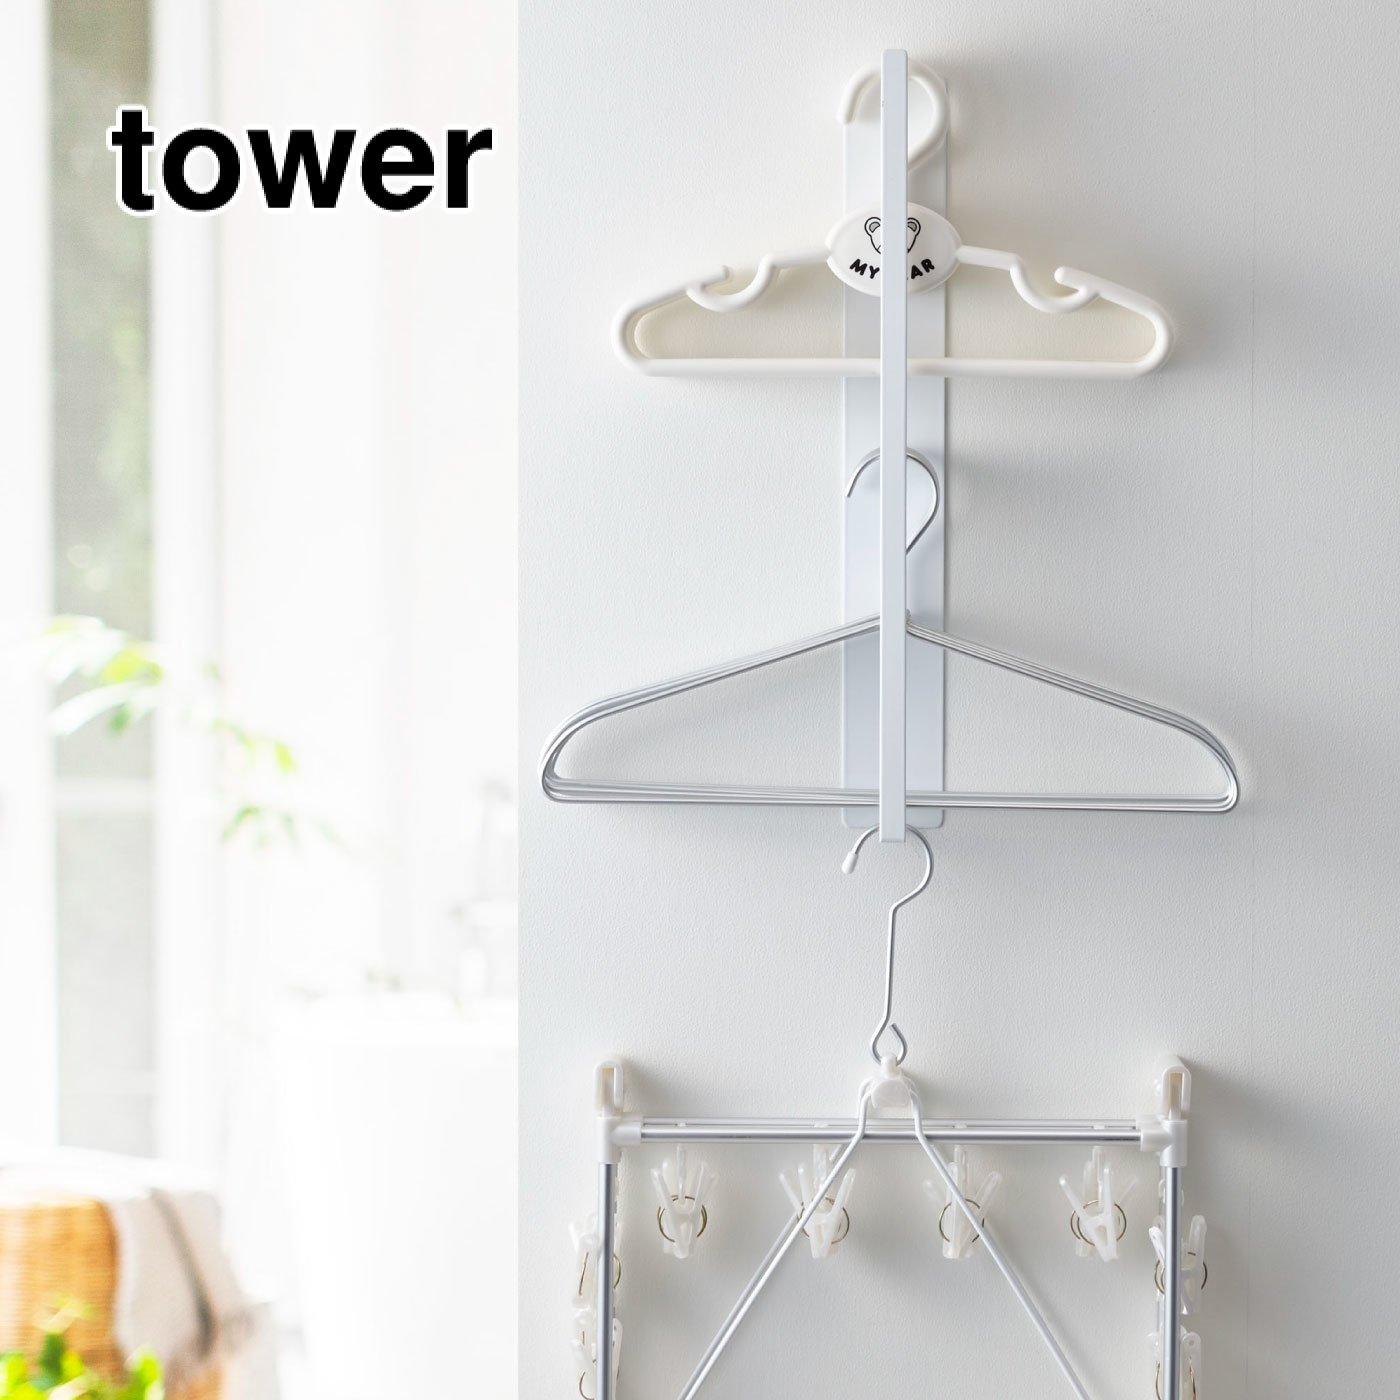 tower 使いかたいろいろ 便利なマグネット洗濯ハンガー収納ラック